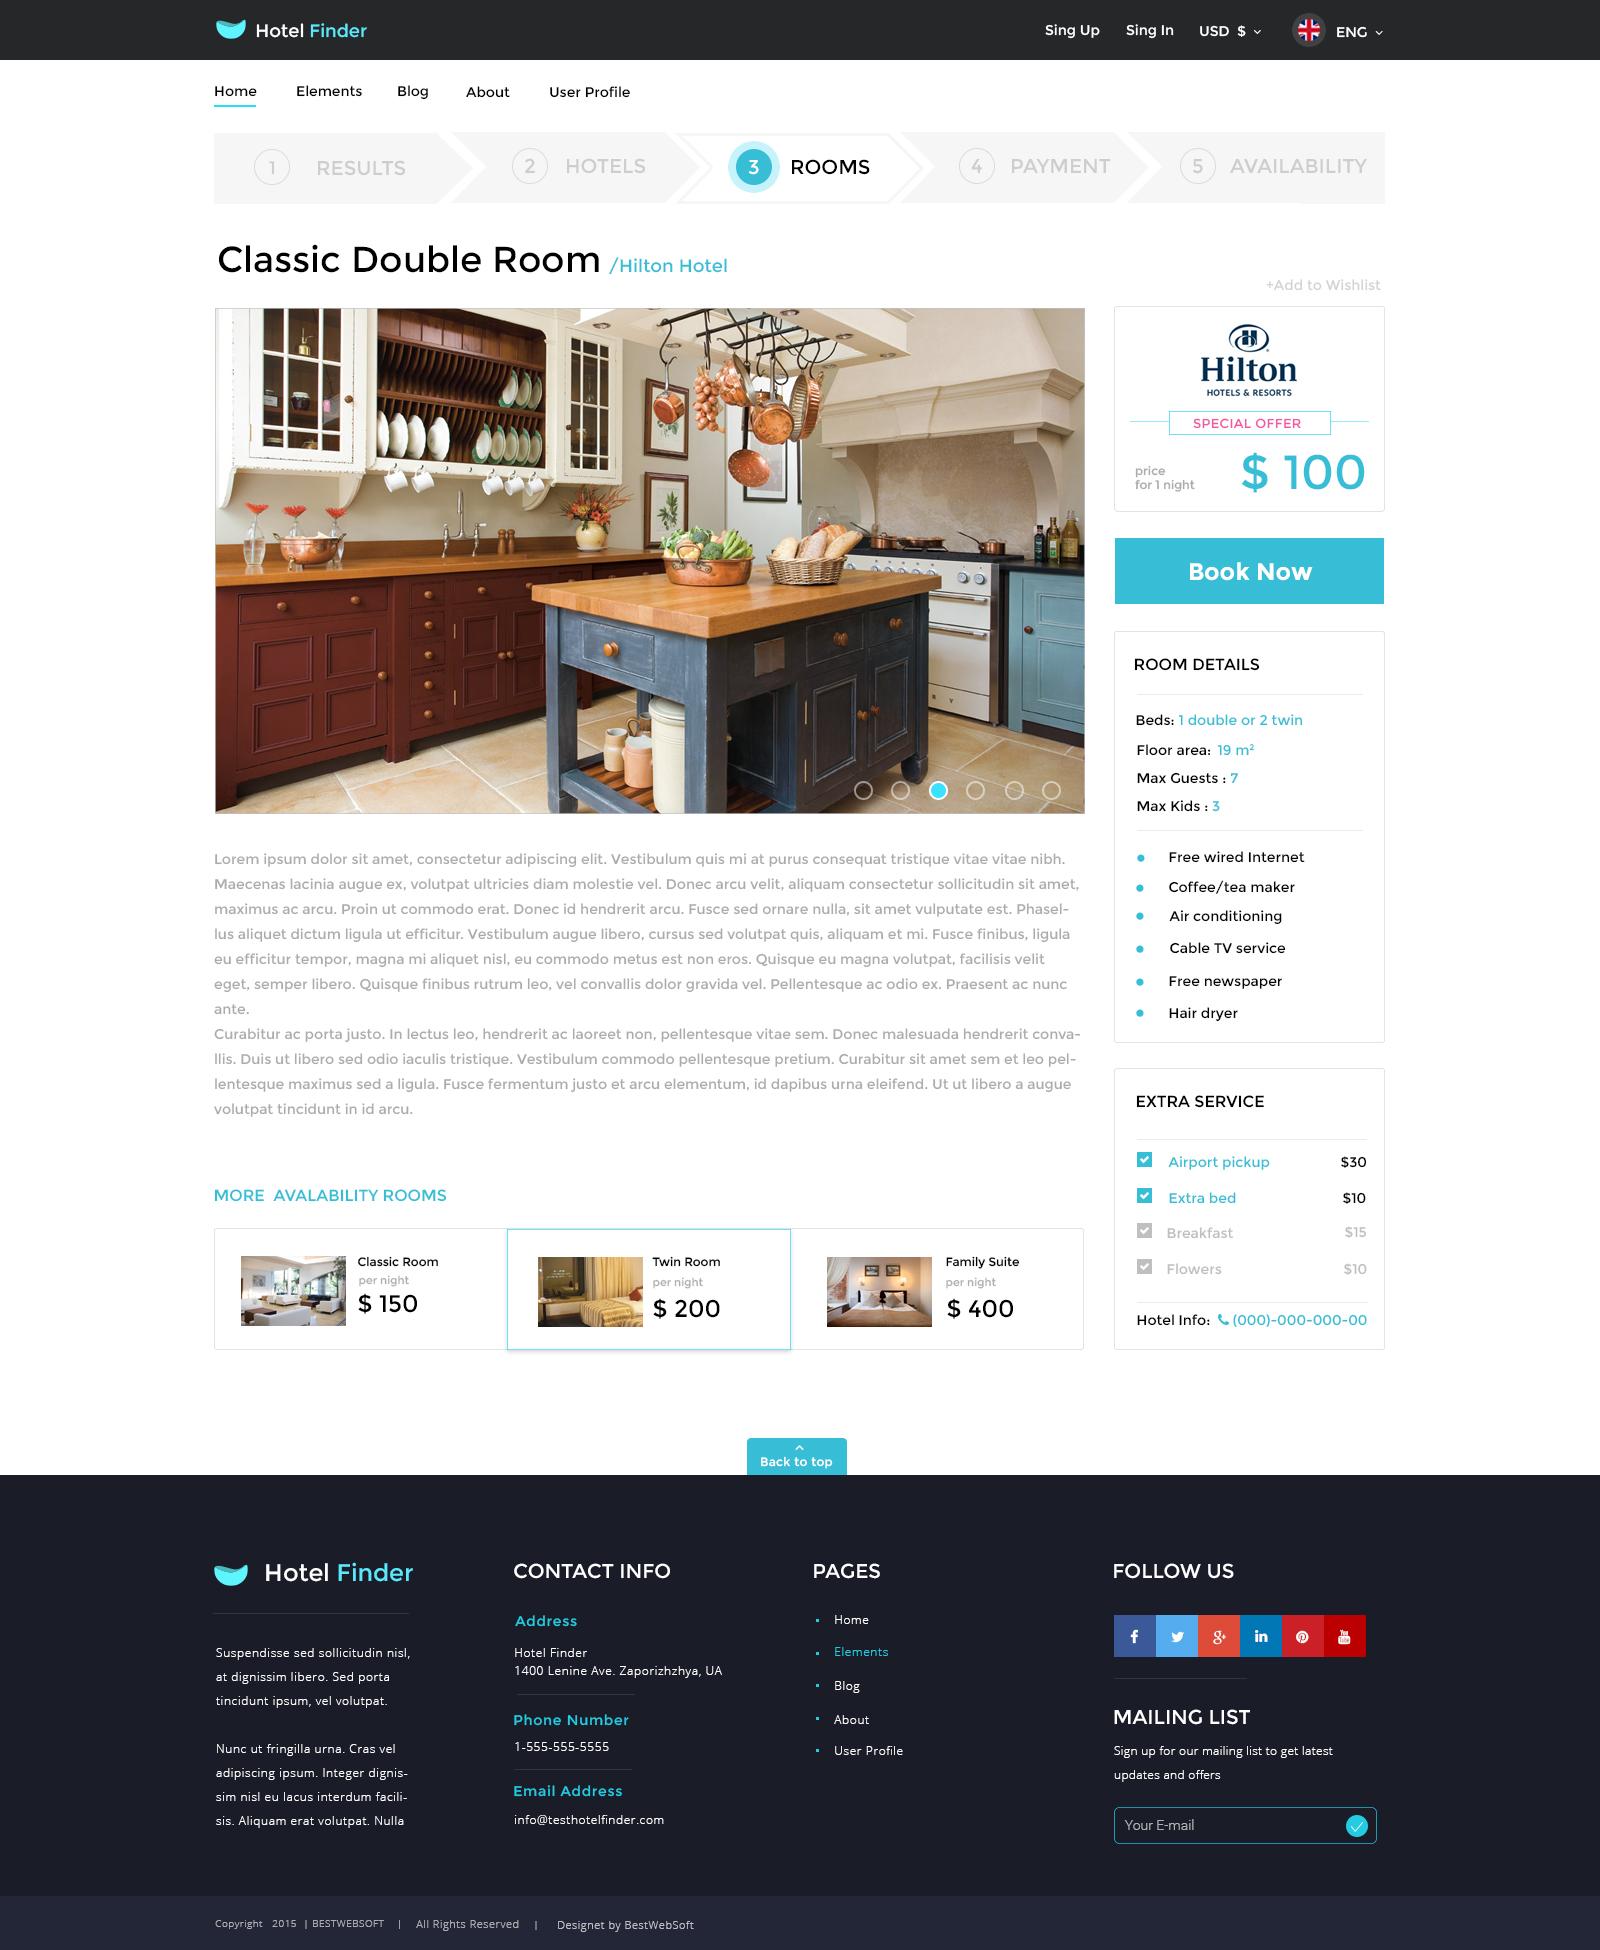 hotel finder online booking html website template by bestwebsoft jpg 11 room page 1200 special offer jpg